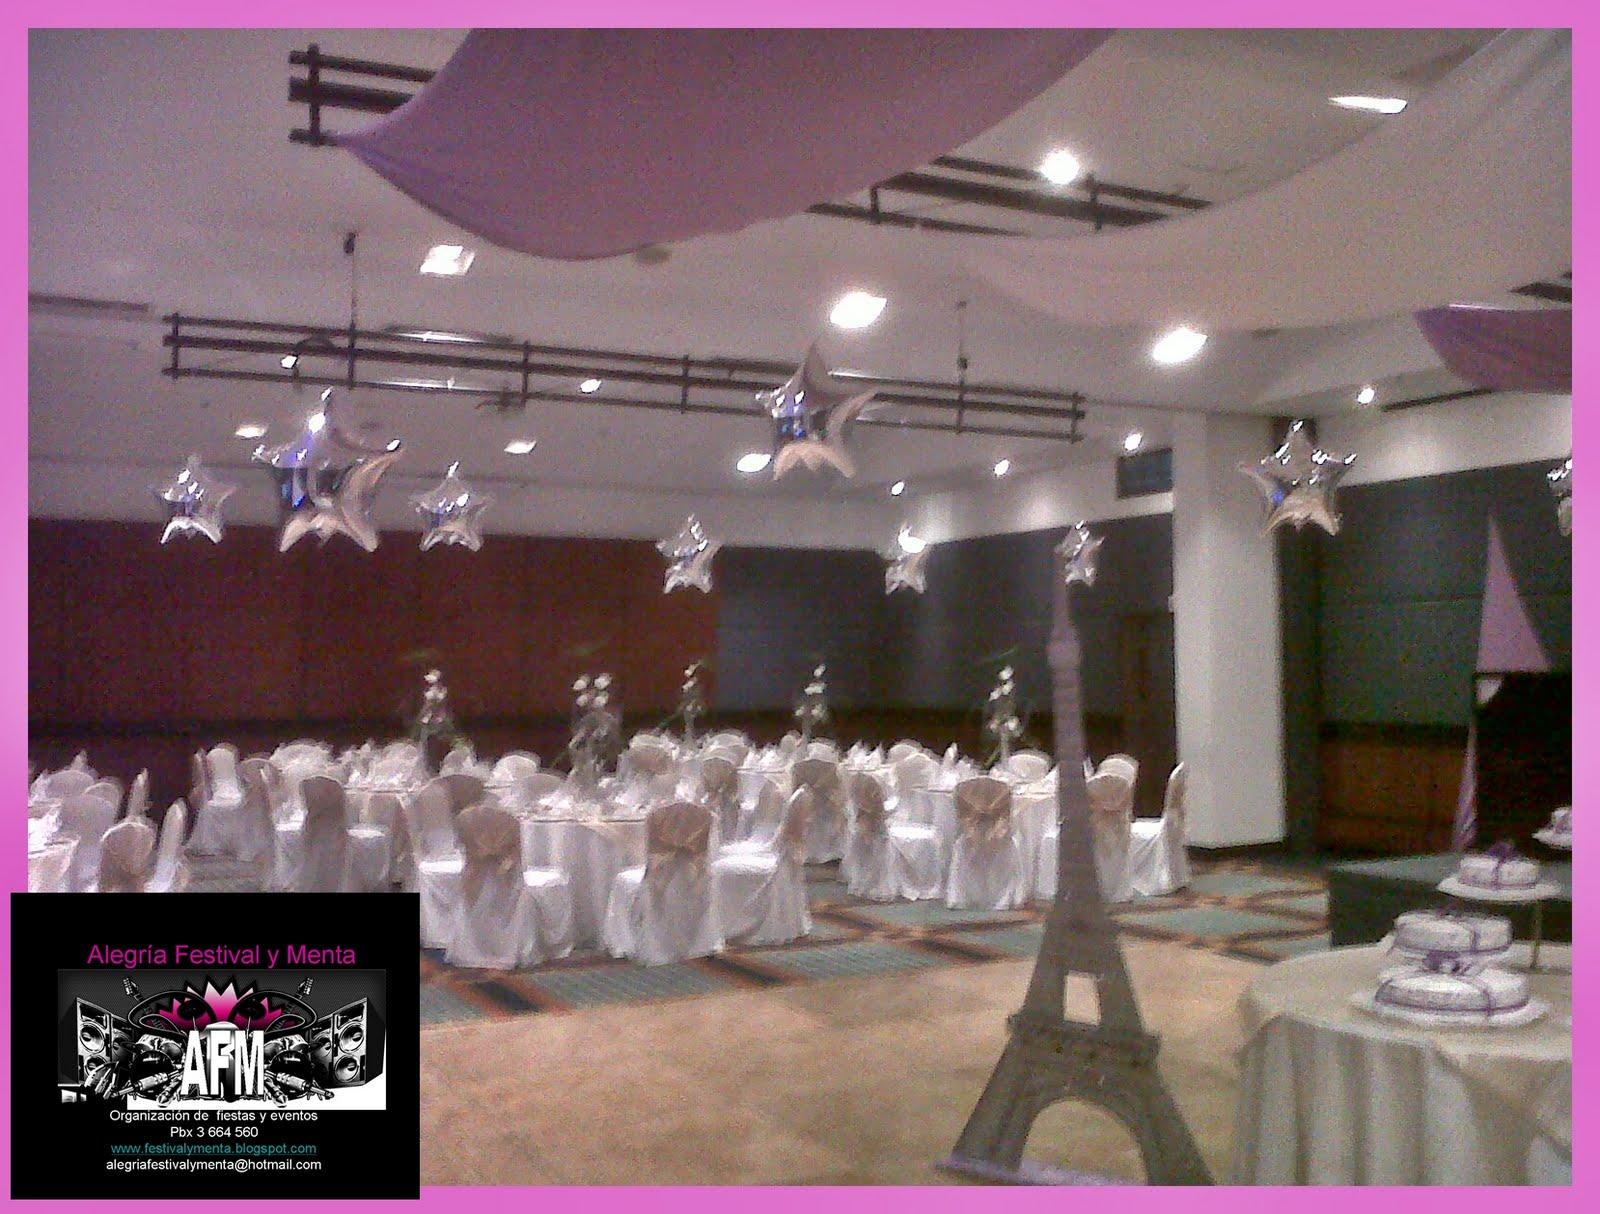 Alegria festival y menta bodas 15 a os fiesta tematica paris for Decoracion bodas